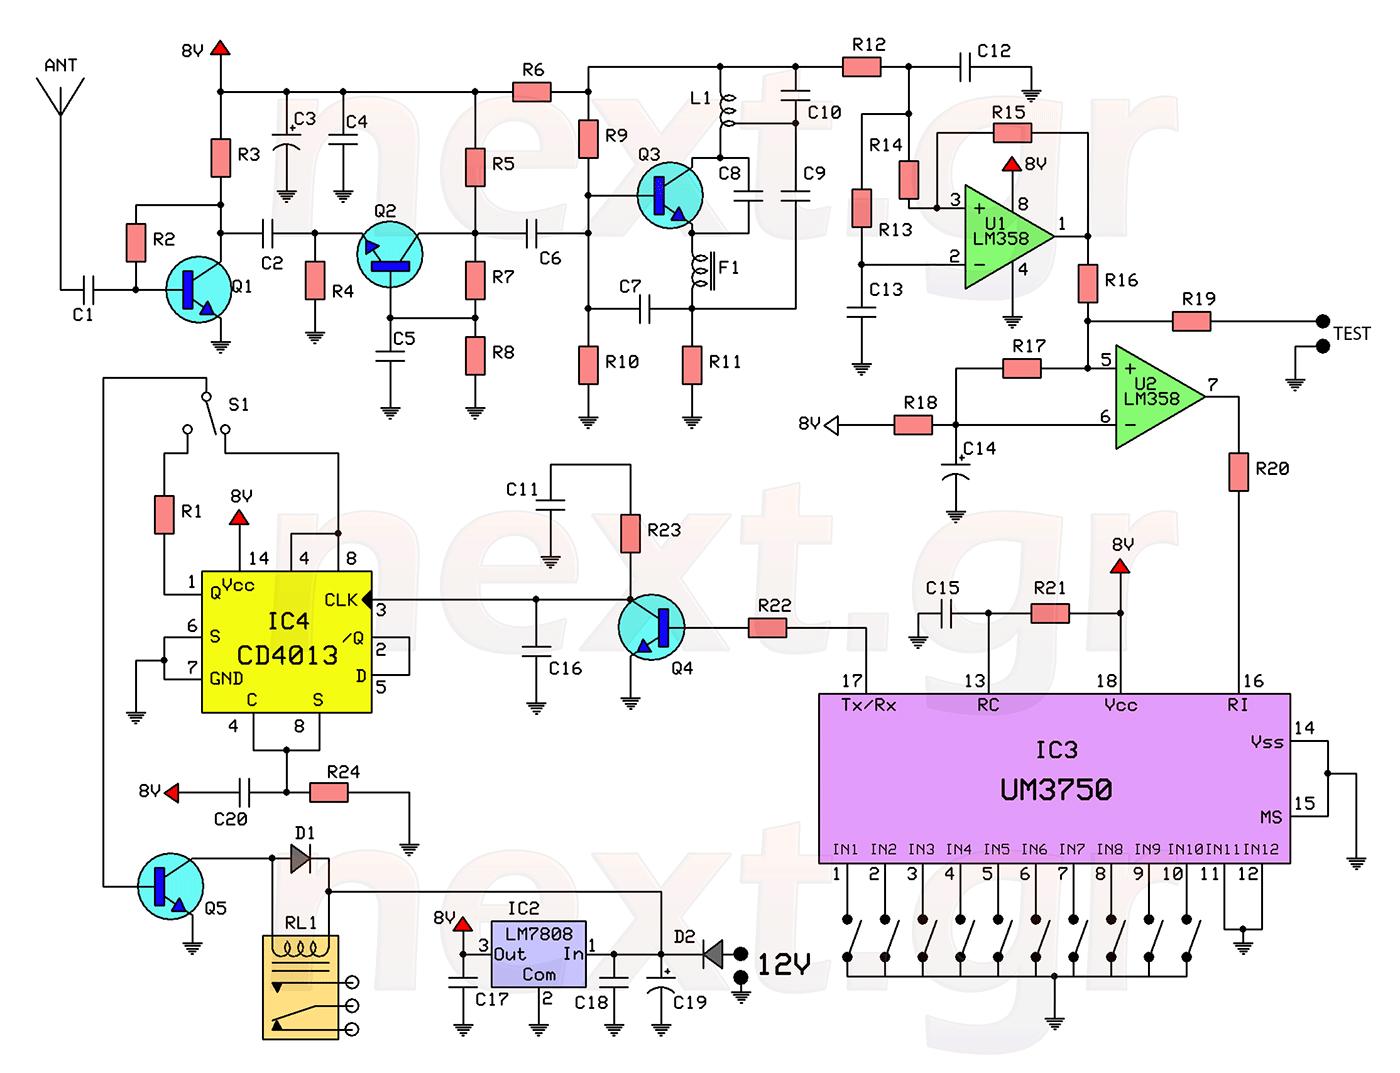 rf remote control switch rx tx circuits schematic tech remote rf remote control circuit diagram electronic circuits pinterest [ 1400 x 1073 Pixel ]